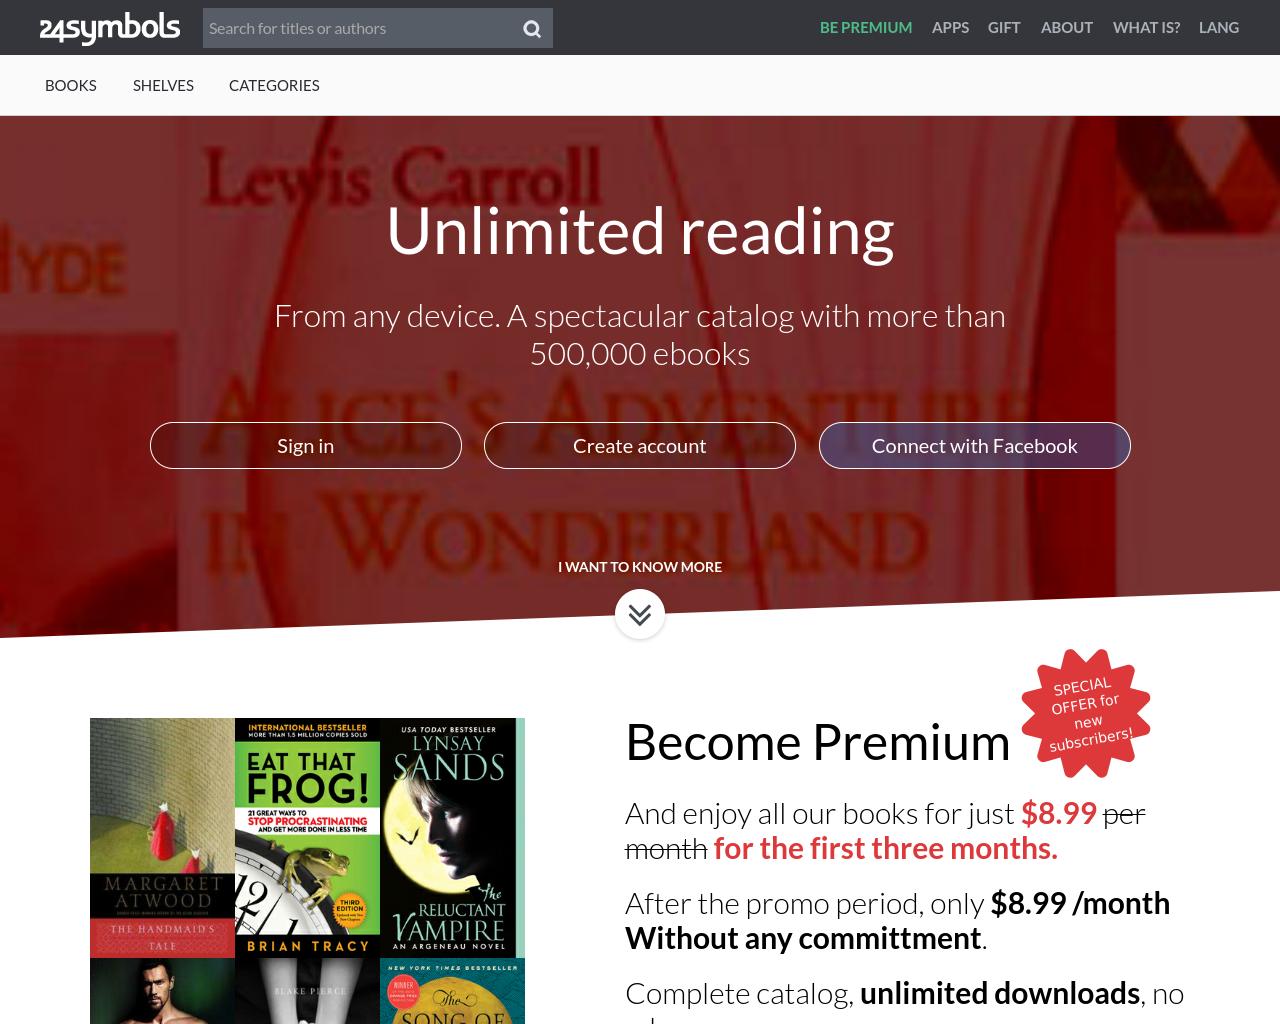 24symbols-Advertising-Reviews-Pricing